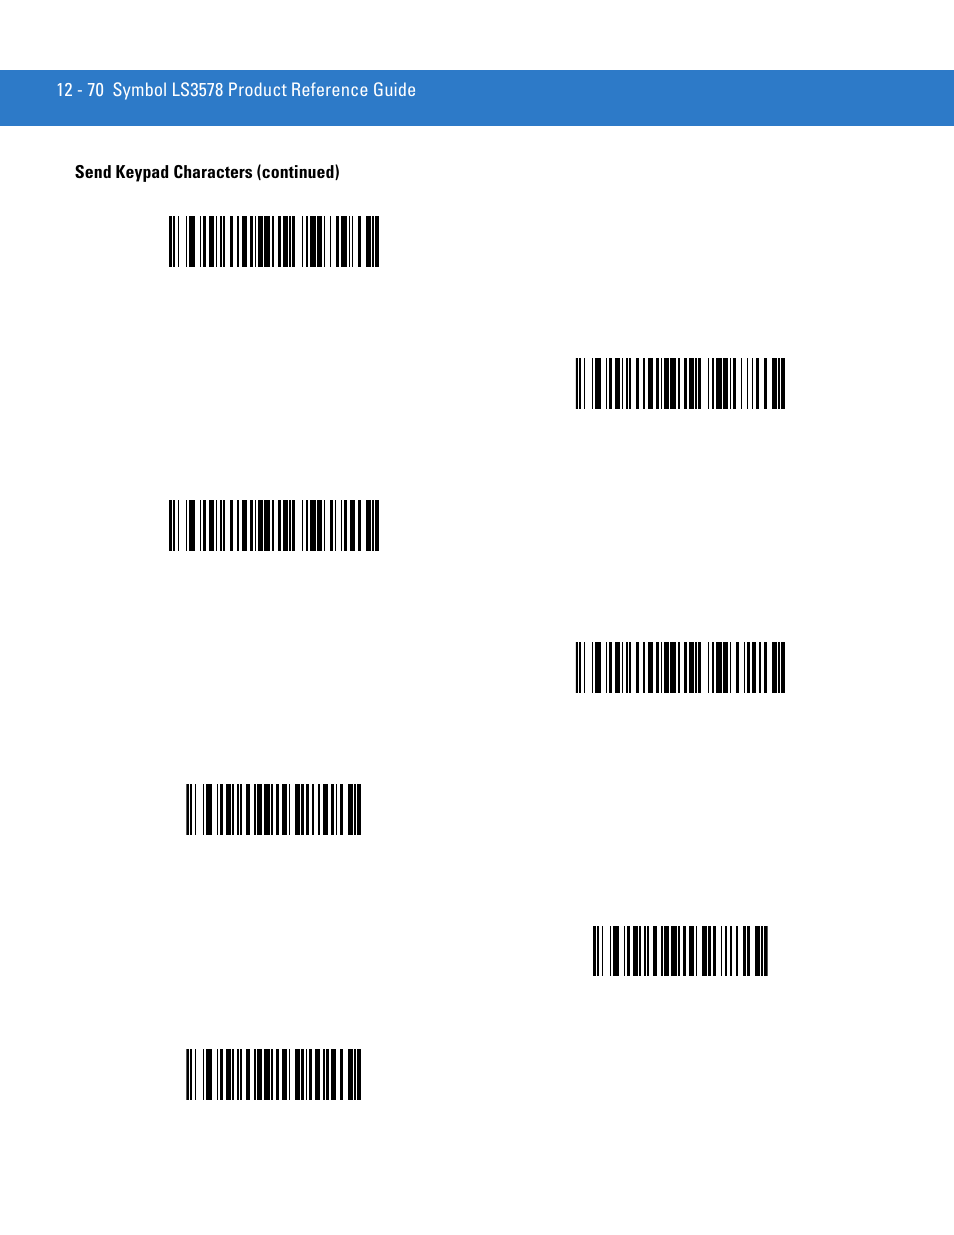 motorola ls3578 user manual page 292 378 rh manualsdir com symbol ls3578 user guide motorola ls3578 user guide